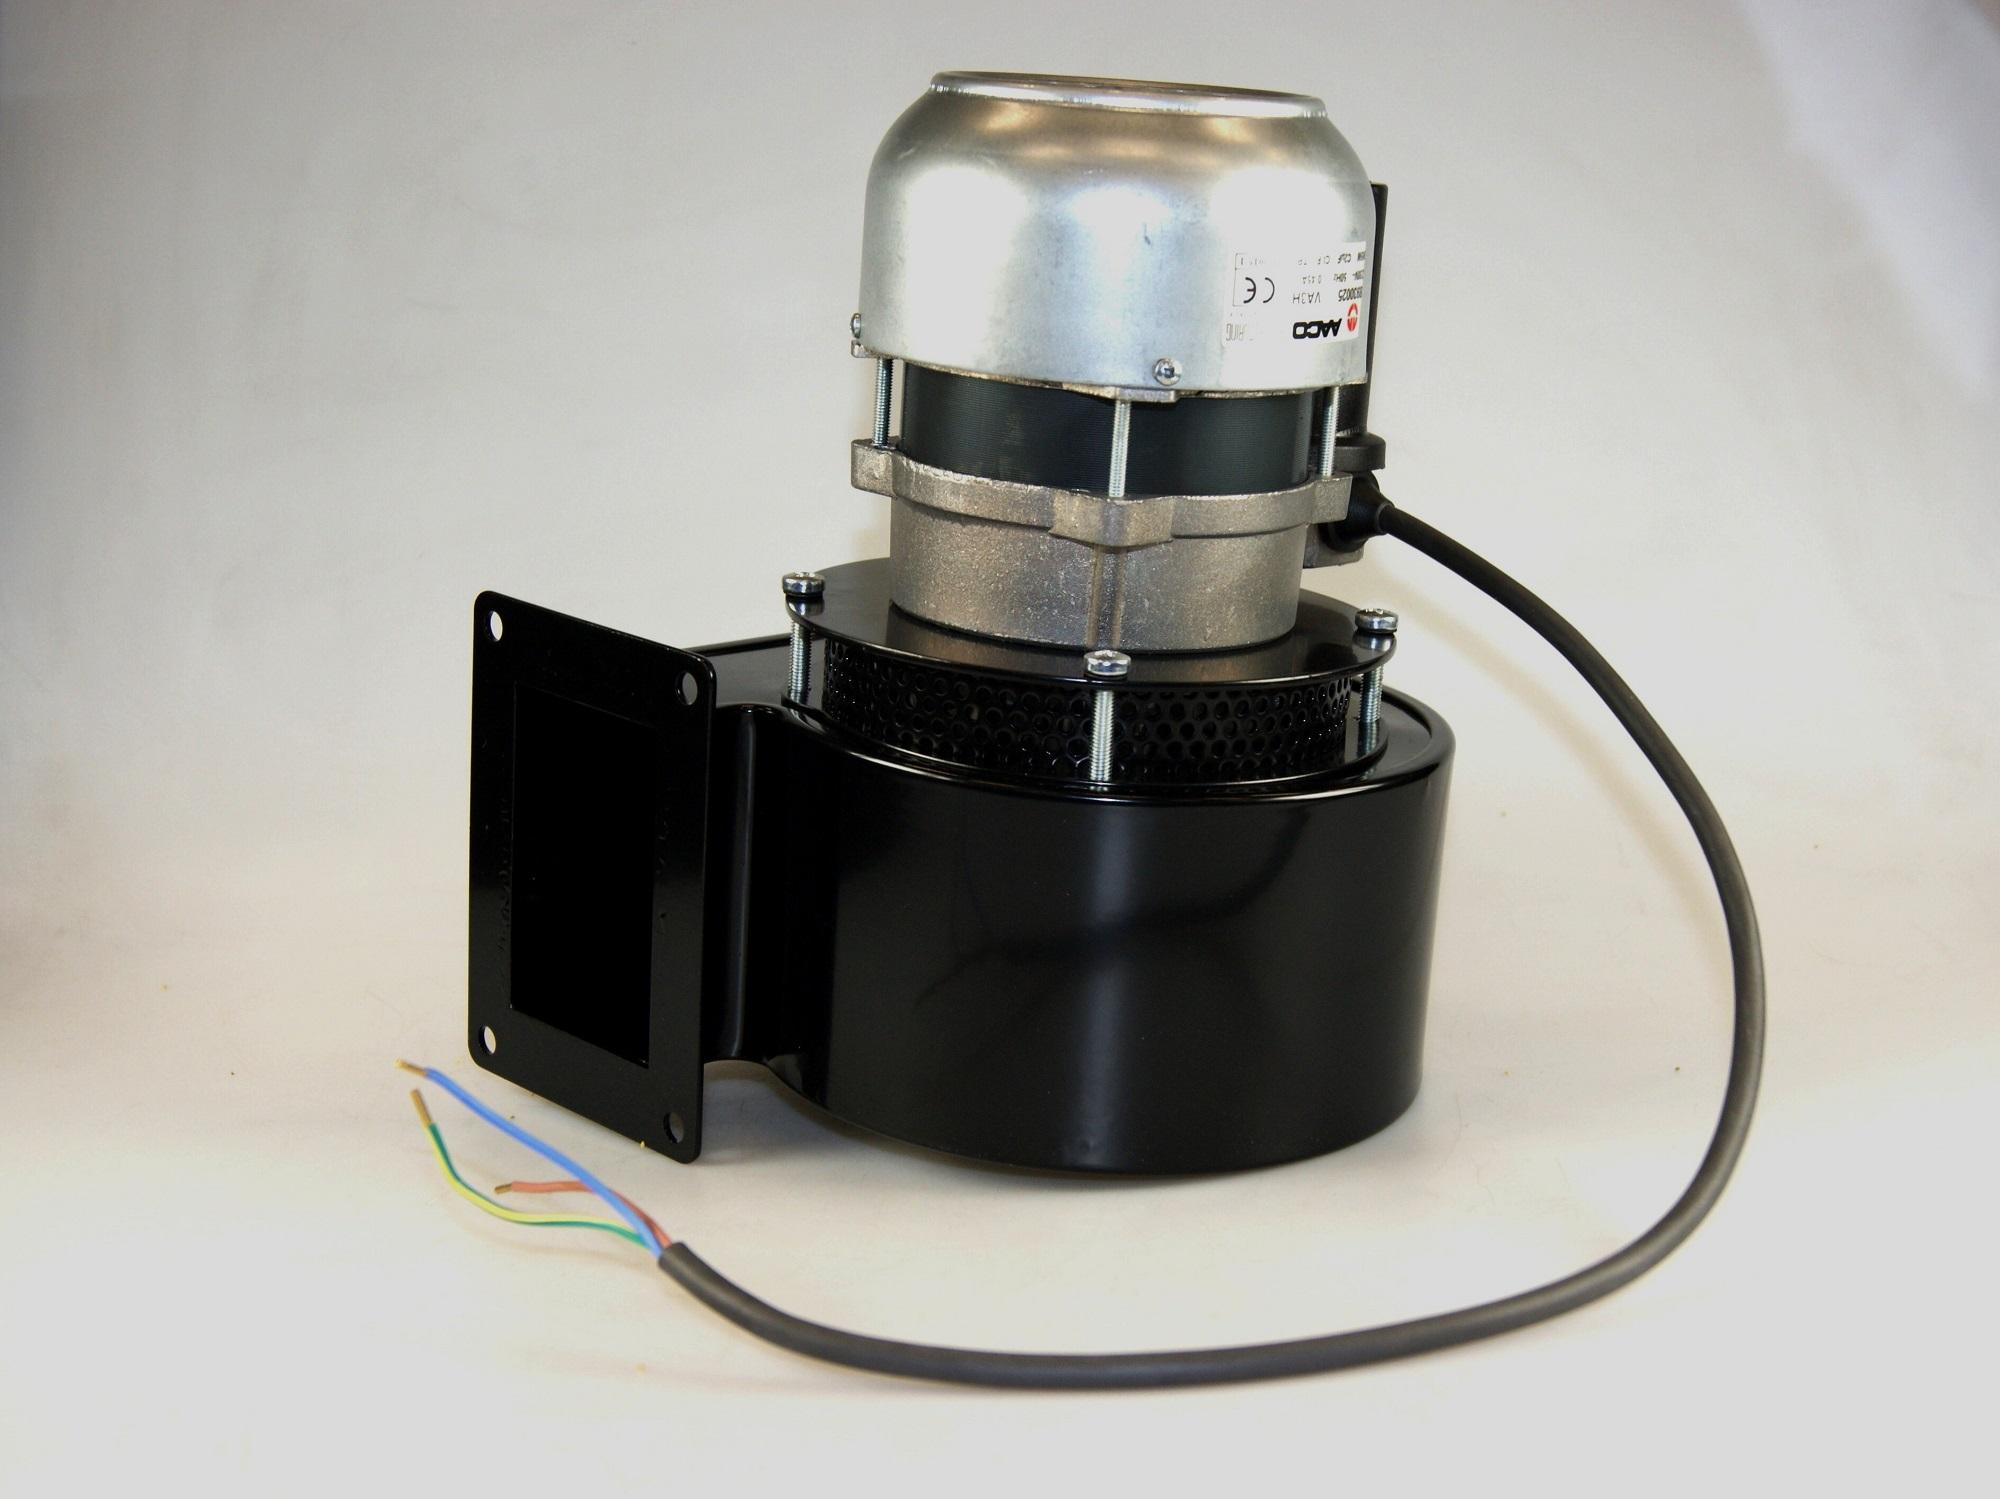 Rookgasventilator Aaco Va3H60R, 230 V. Winterwarm